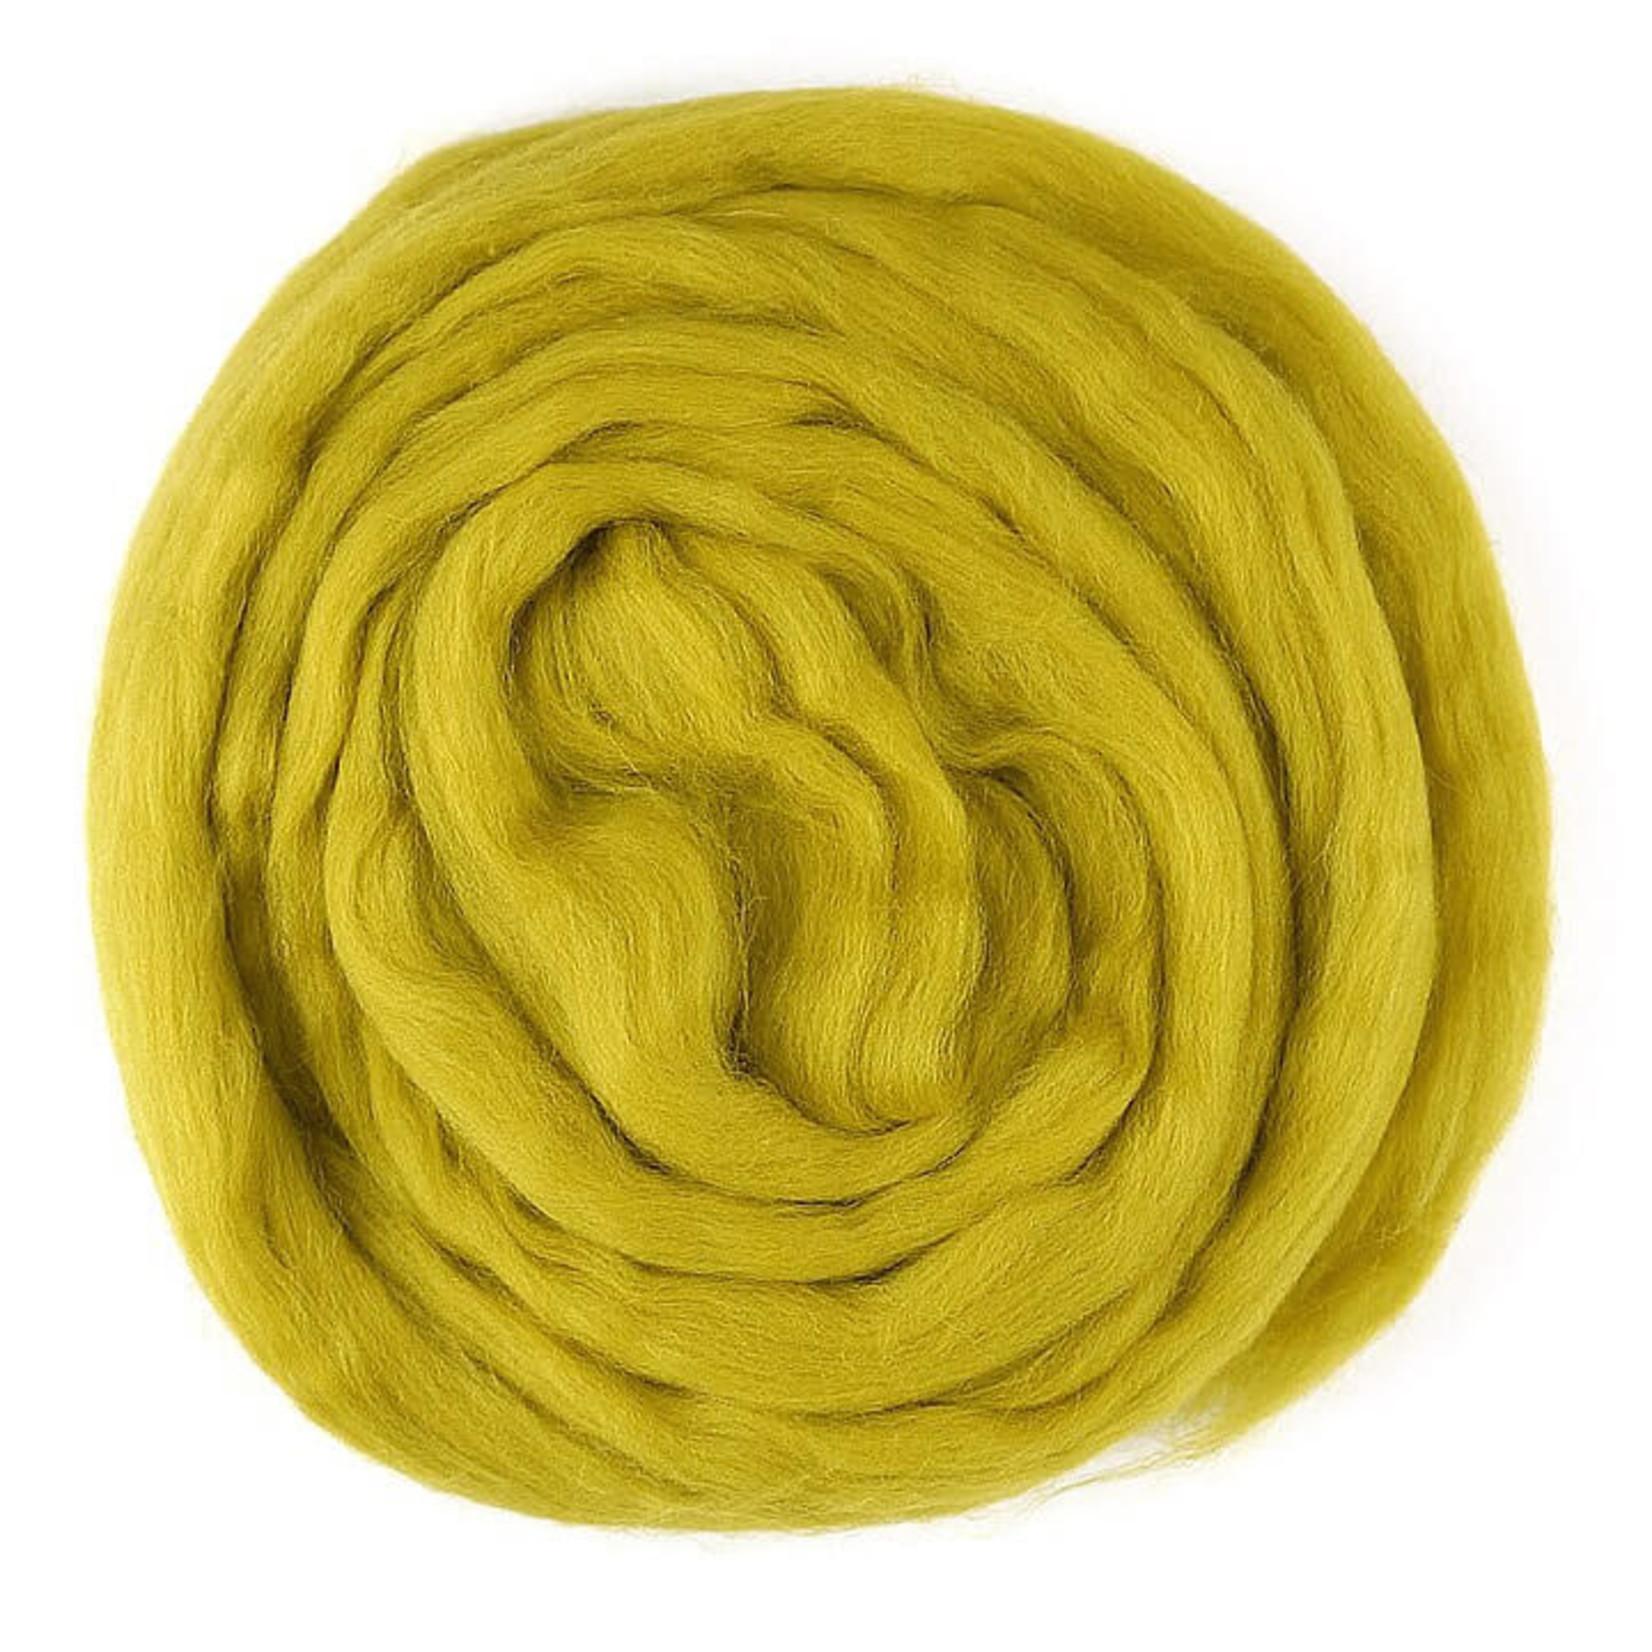 Meervilt Lontwol Merino EU - 603 Mustard - 50 gr.